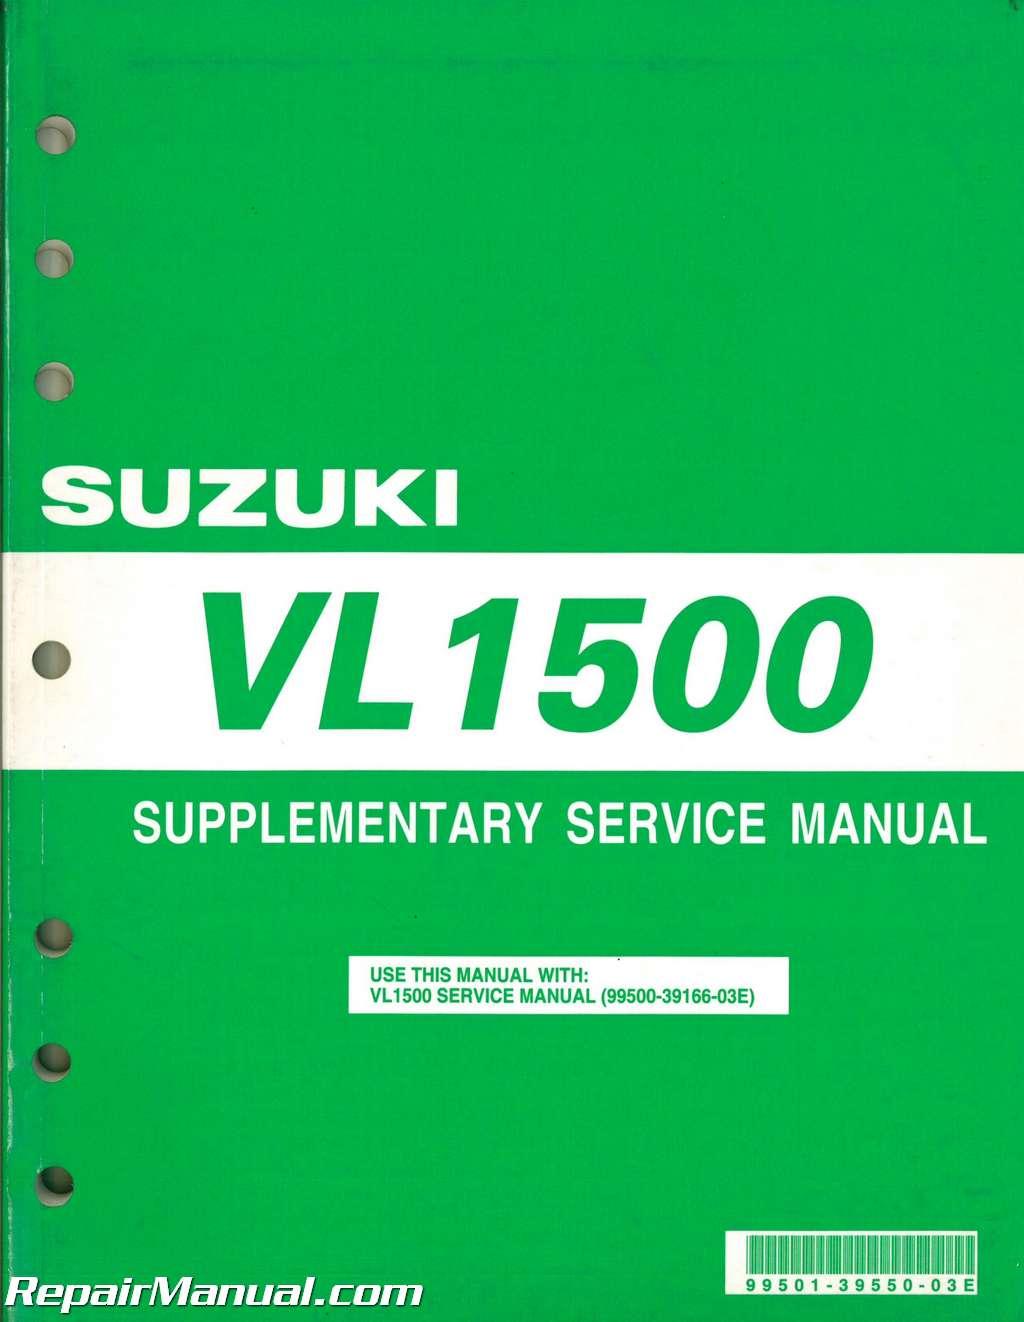 Suzuki Intruder Service Manual